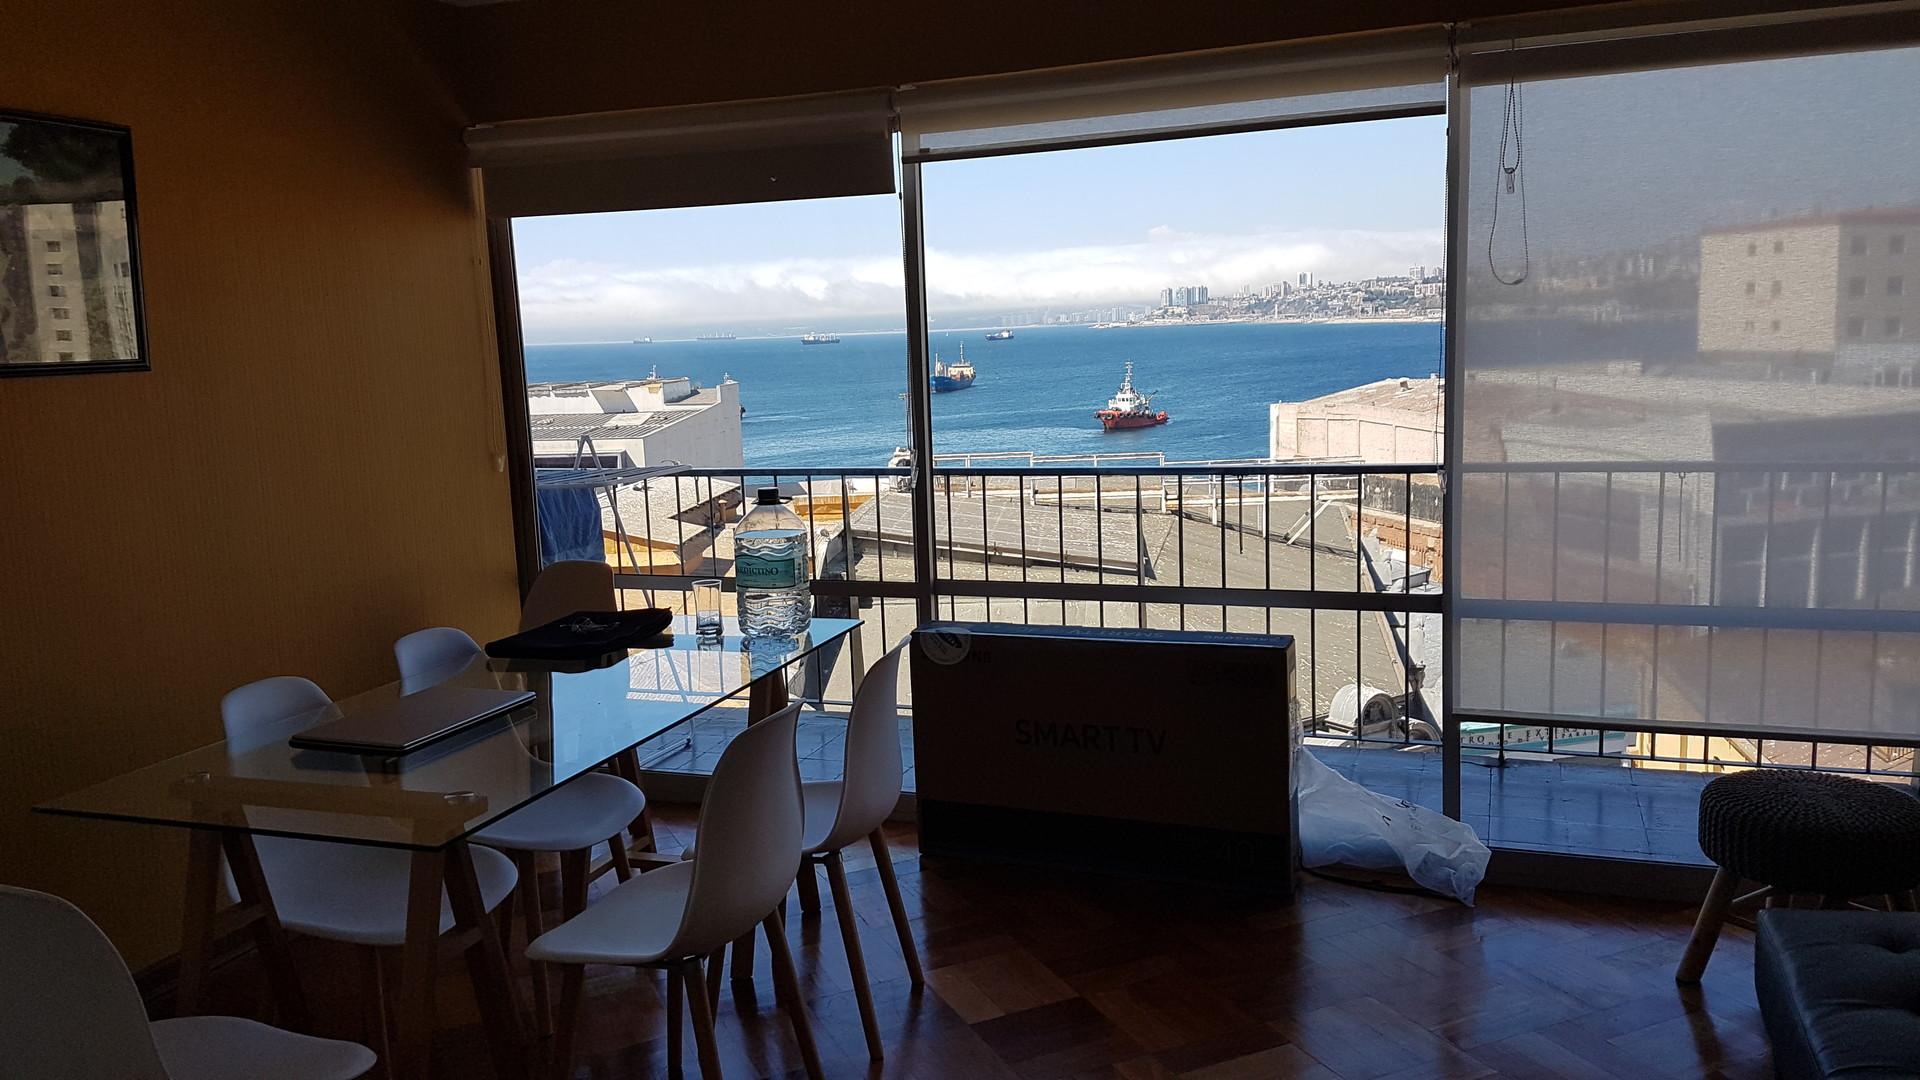 Ocean View In The Center Of Valparaiso Bank Restaurantsbars Bus